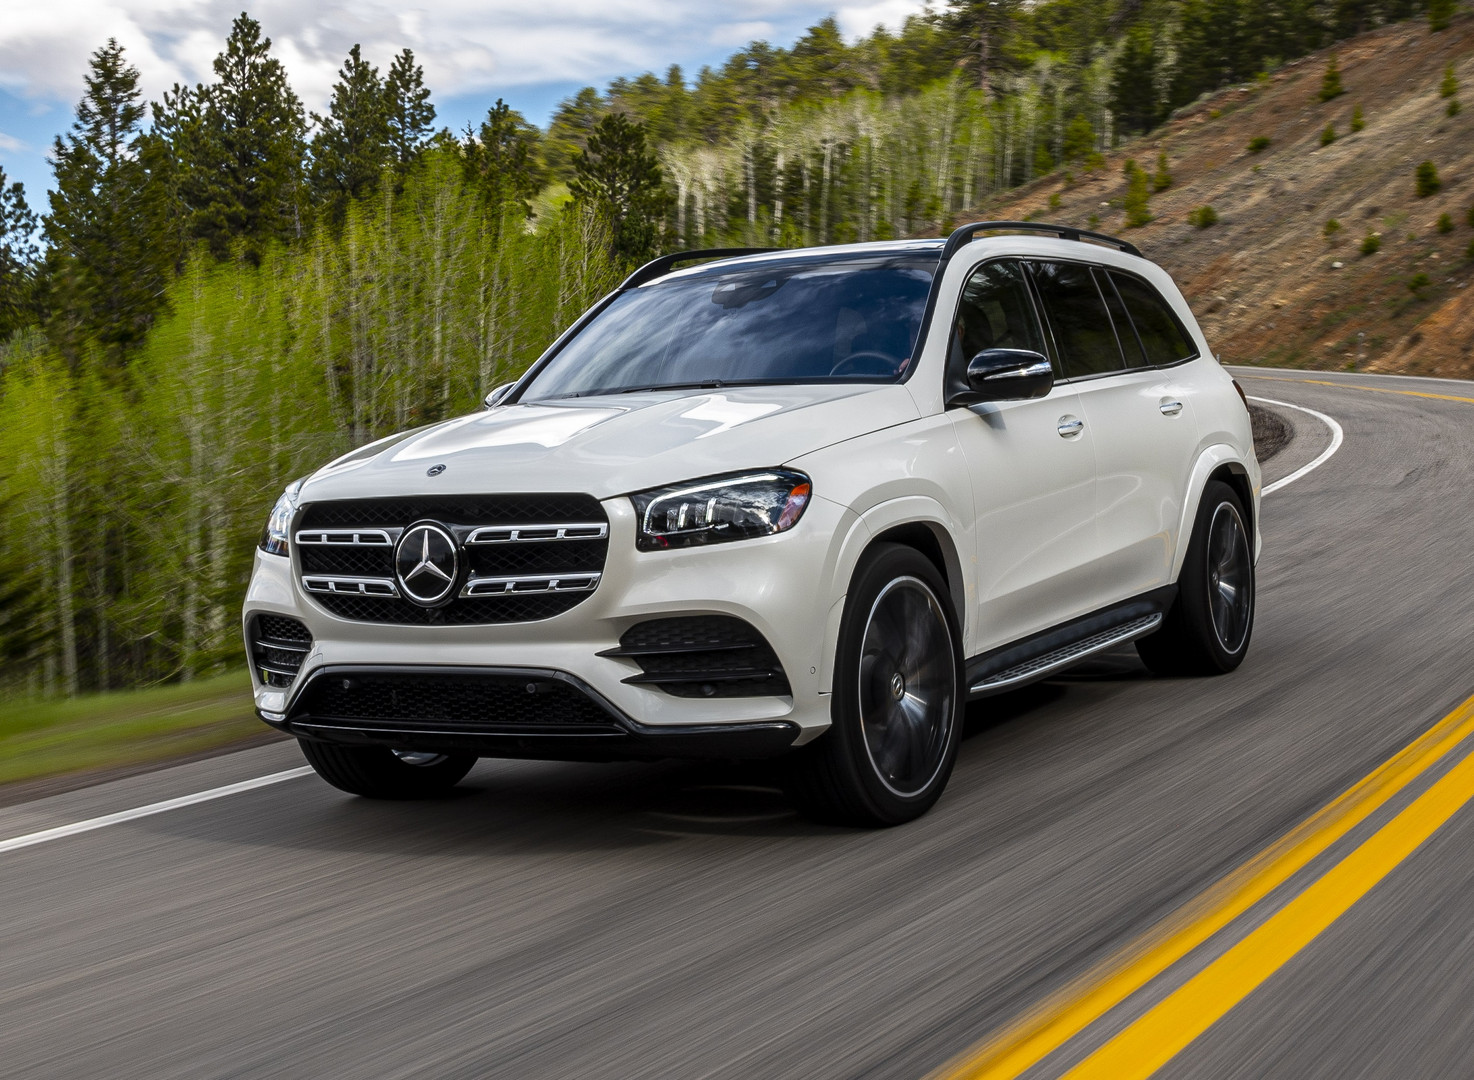 Mercedes benz gls 2020